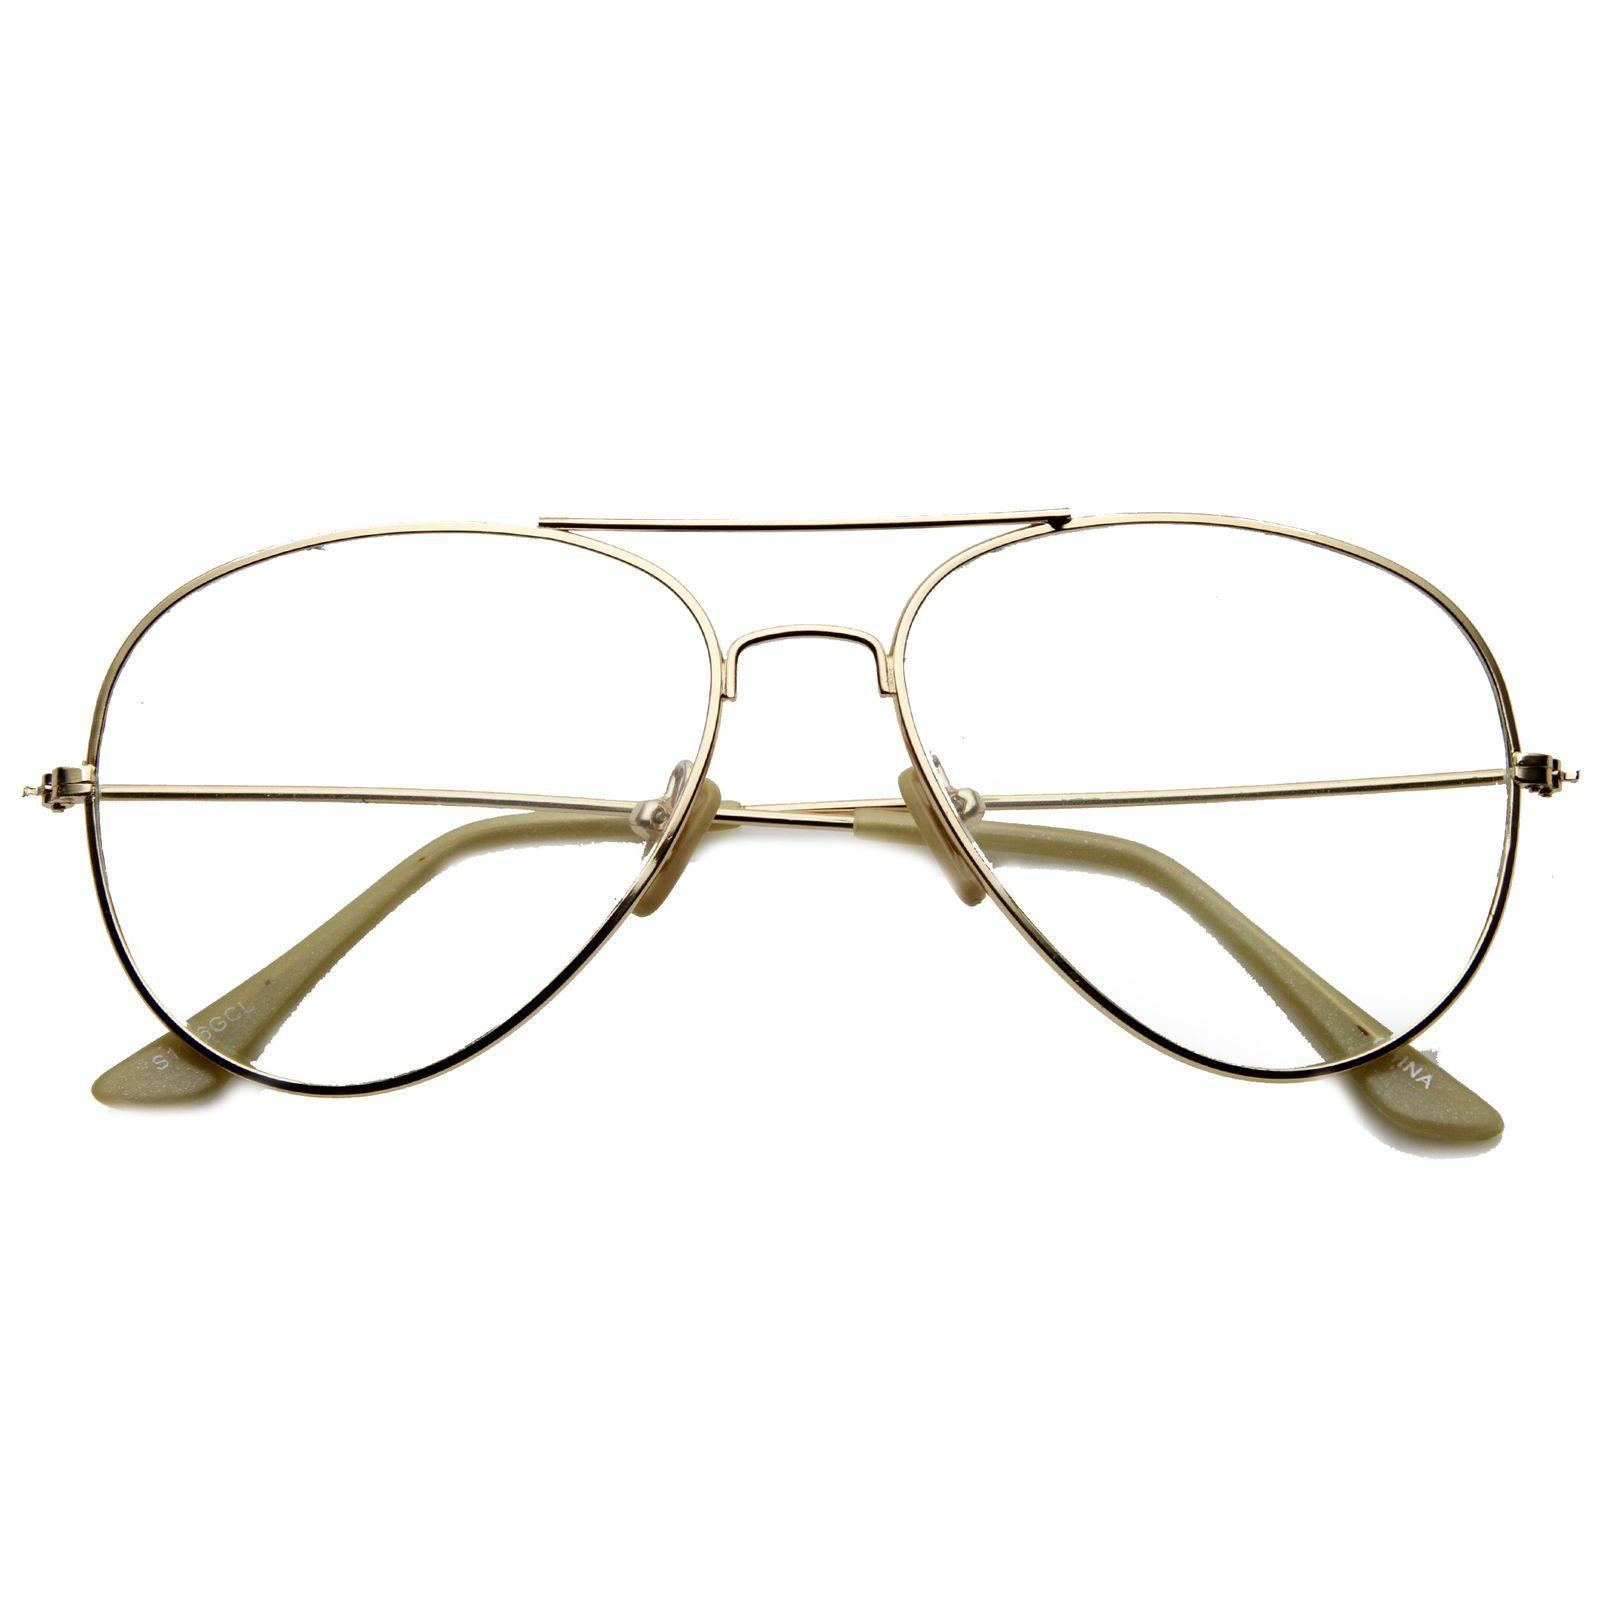 8e1b75a5f22 Sunglassla Nickel Plated Wire Frame Basic Metal Clear Lens Aviator Glasses   ebay  Fashion